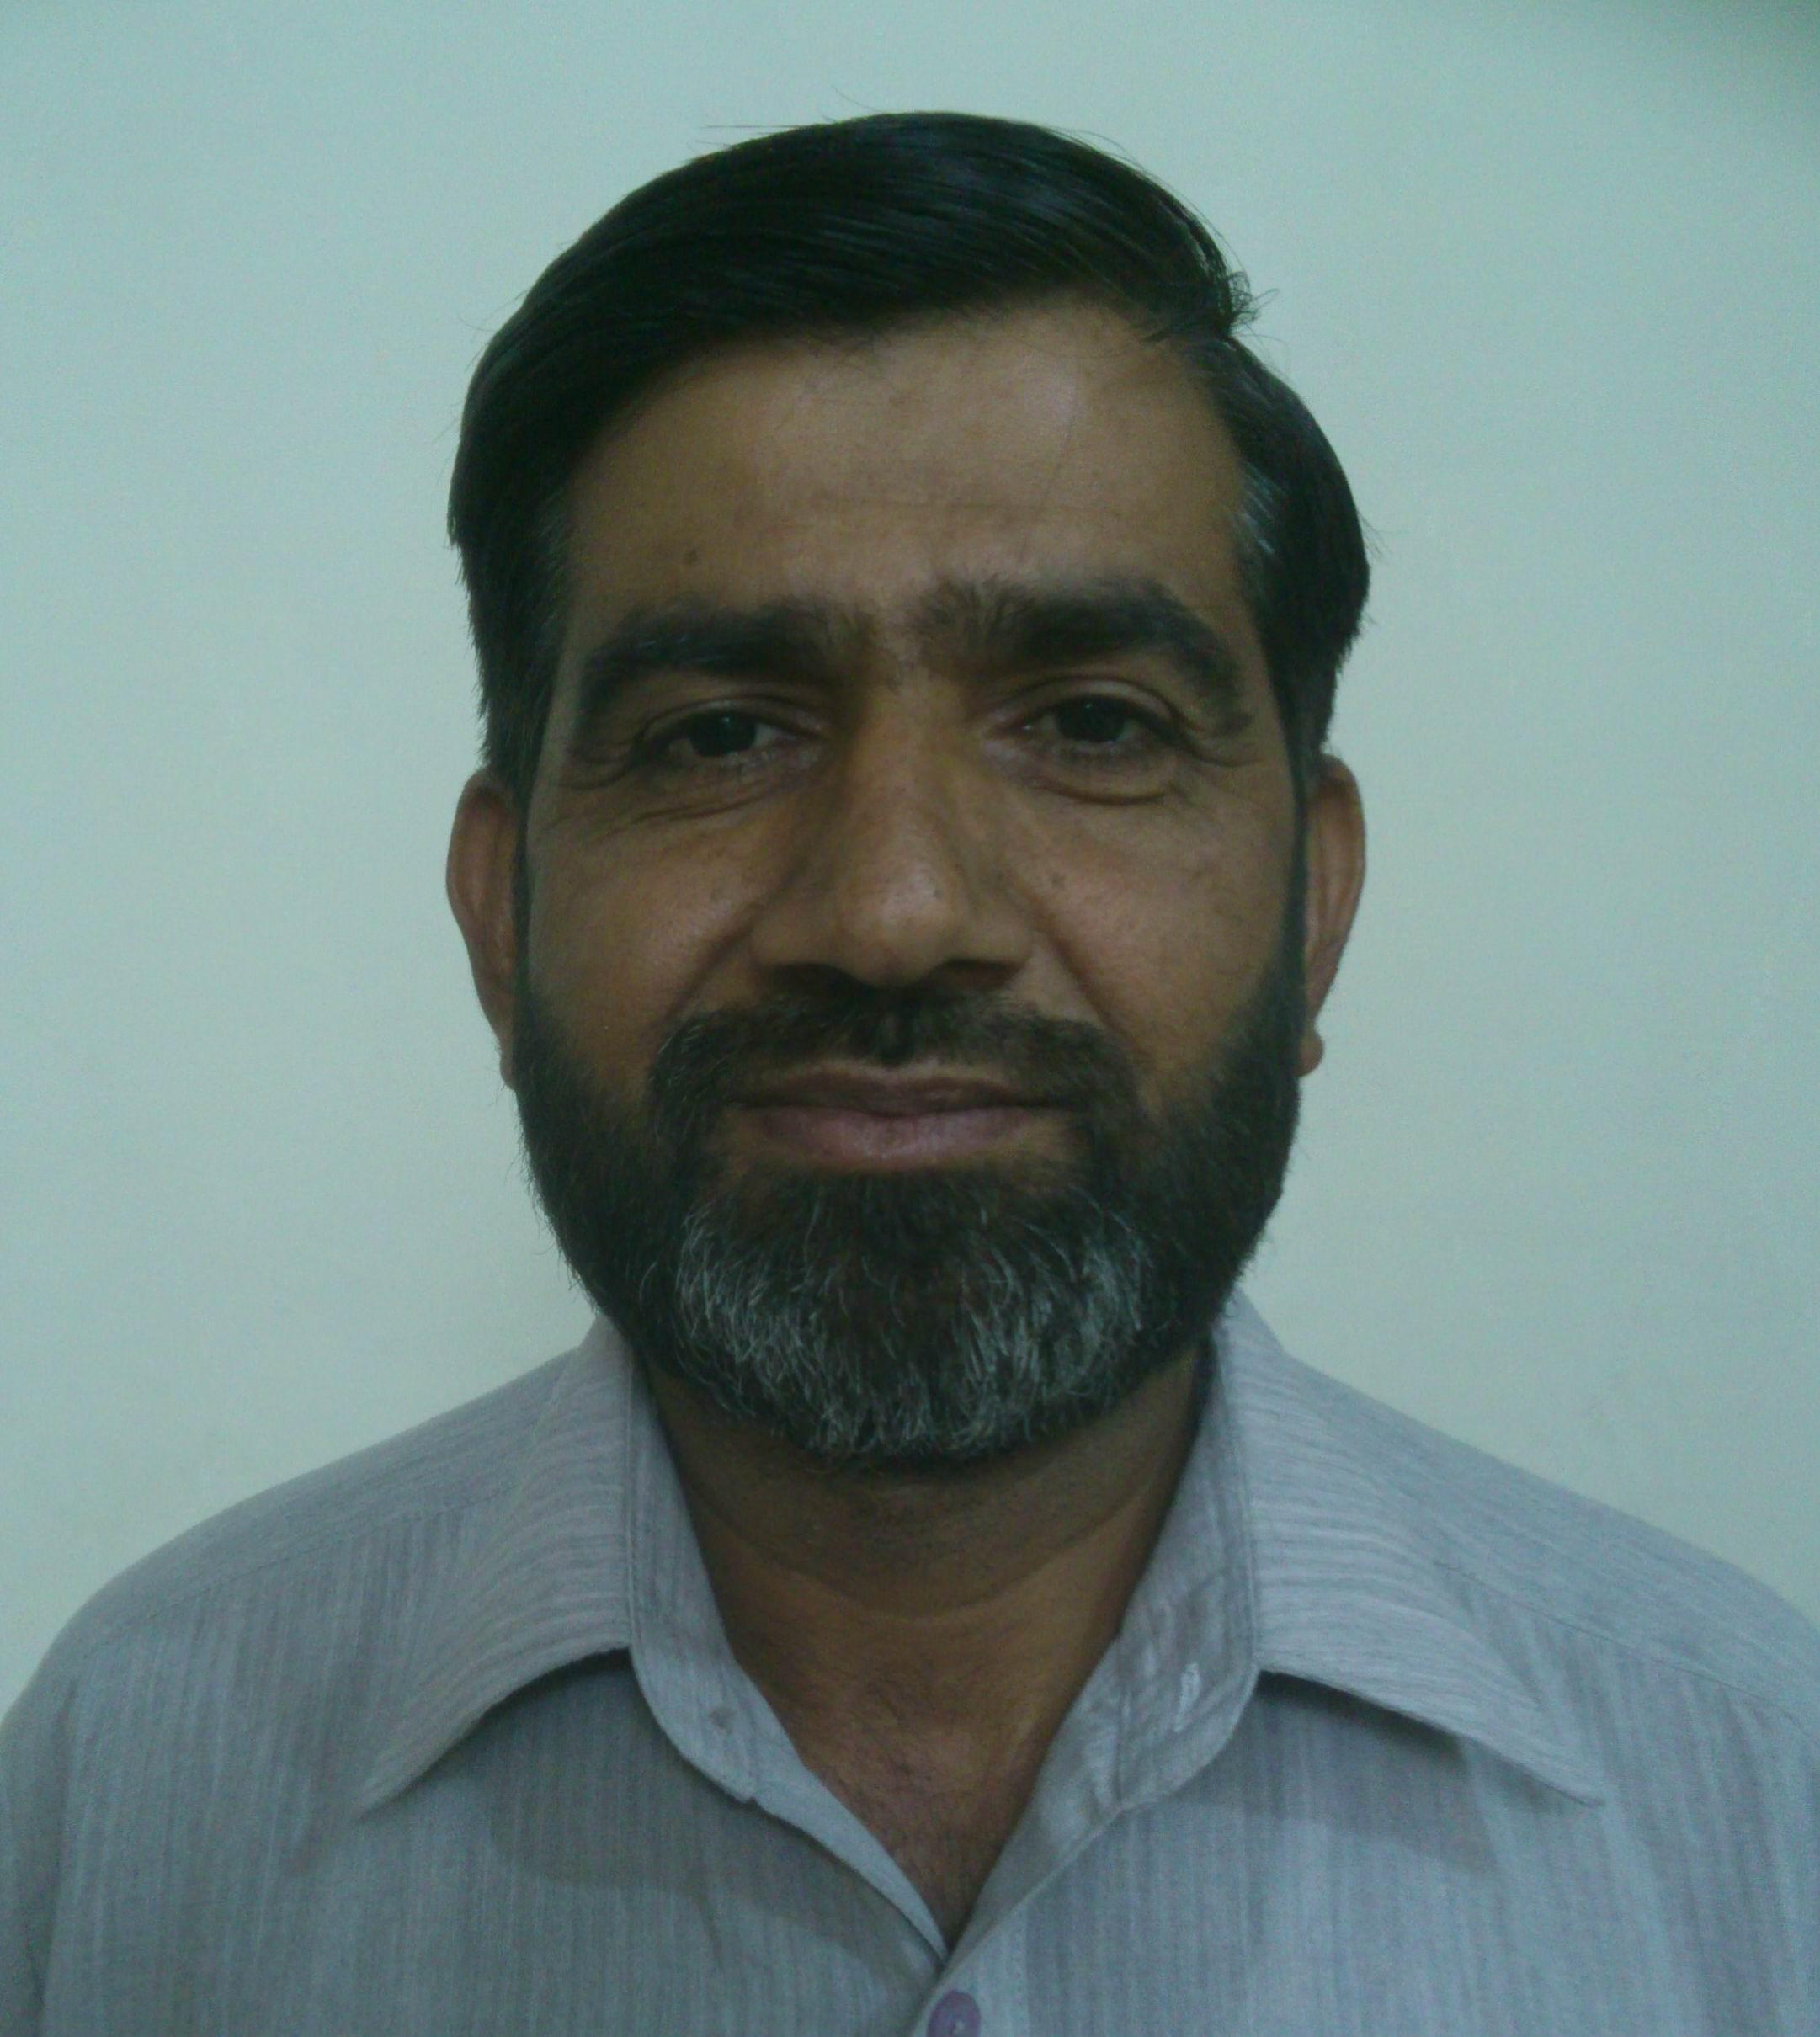 Muhammad Fazil